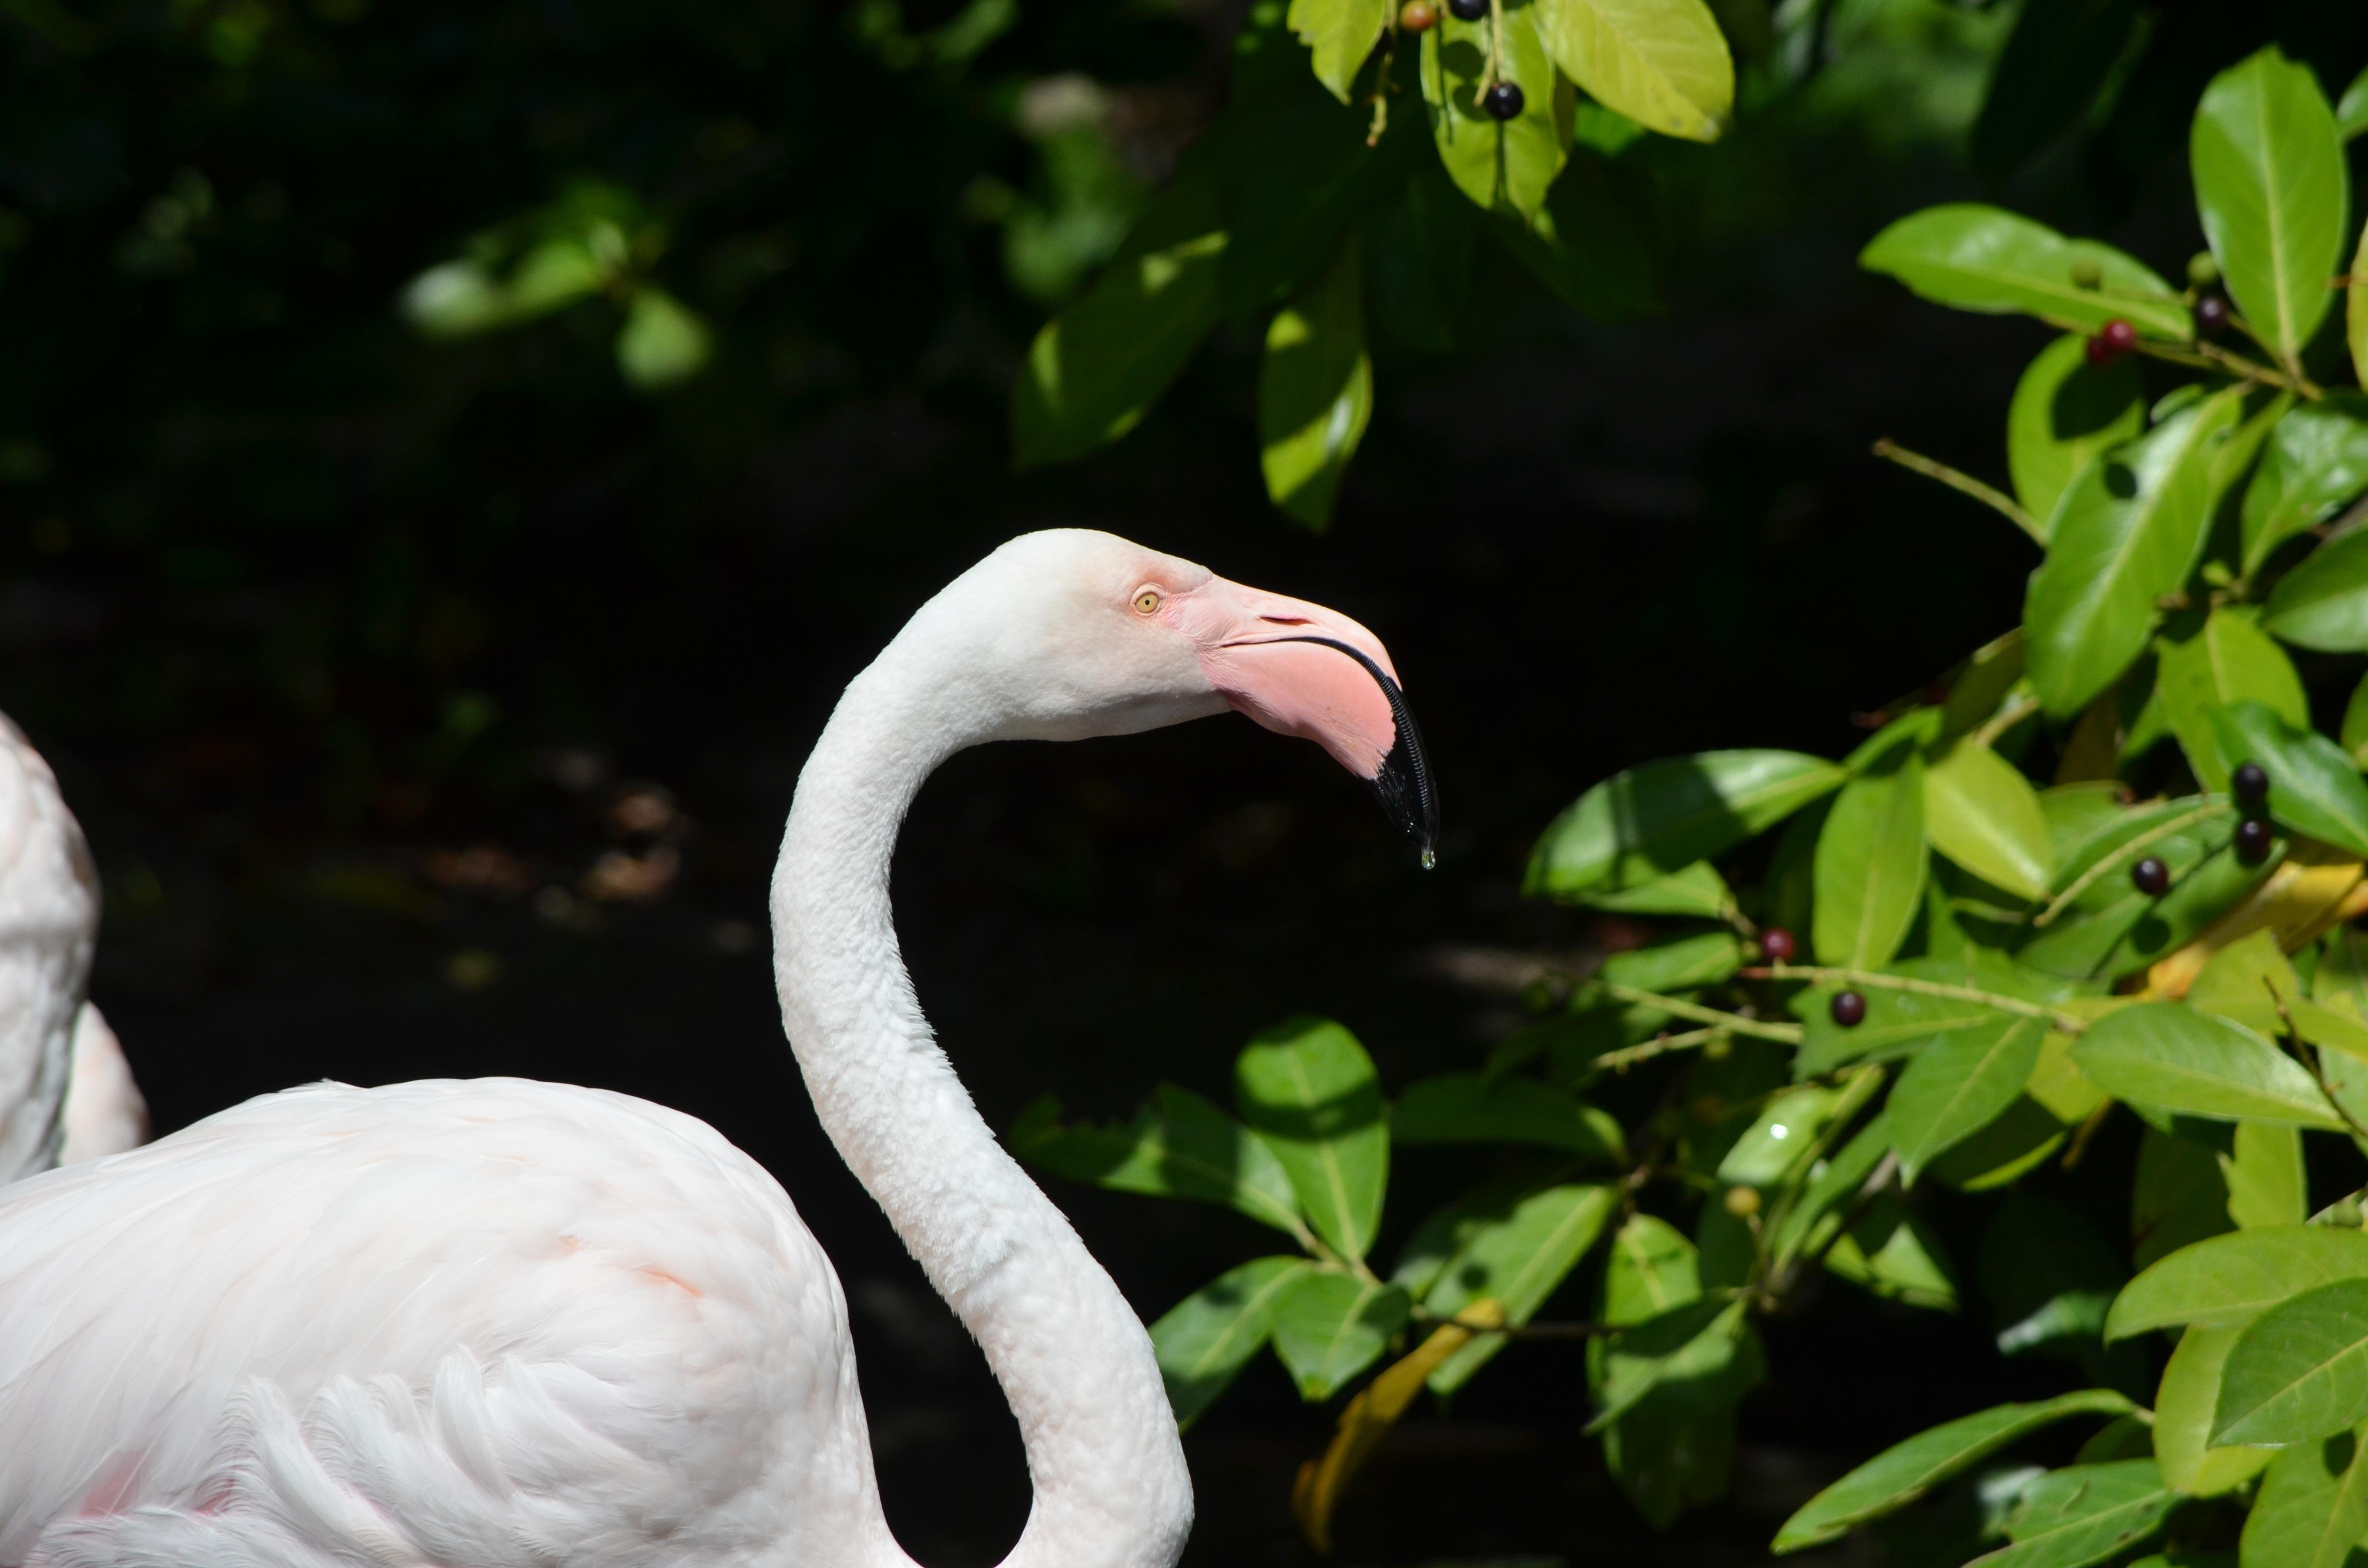 Immagini Belle Natura Zoo Becco Rosa Piuma Fauna Cigno